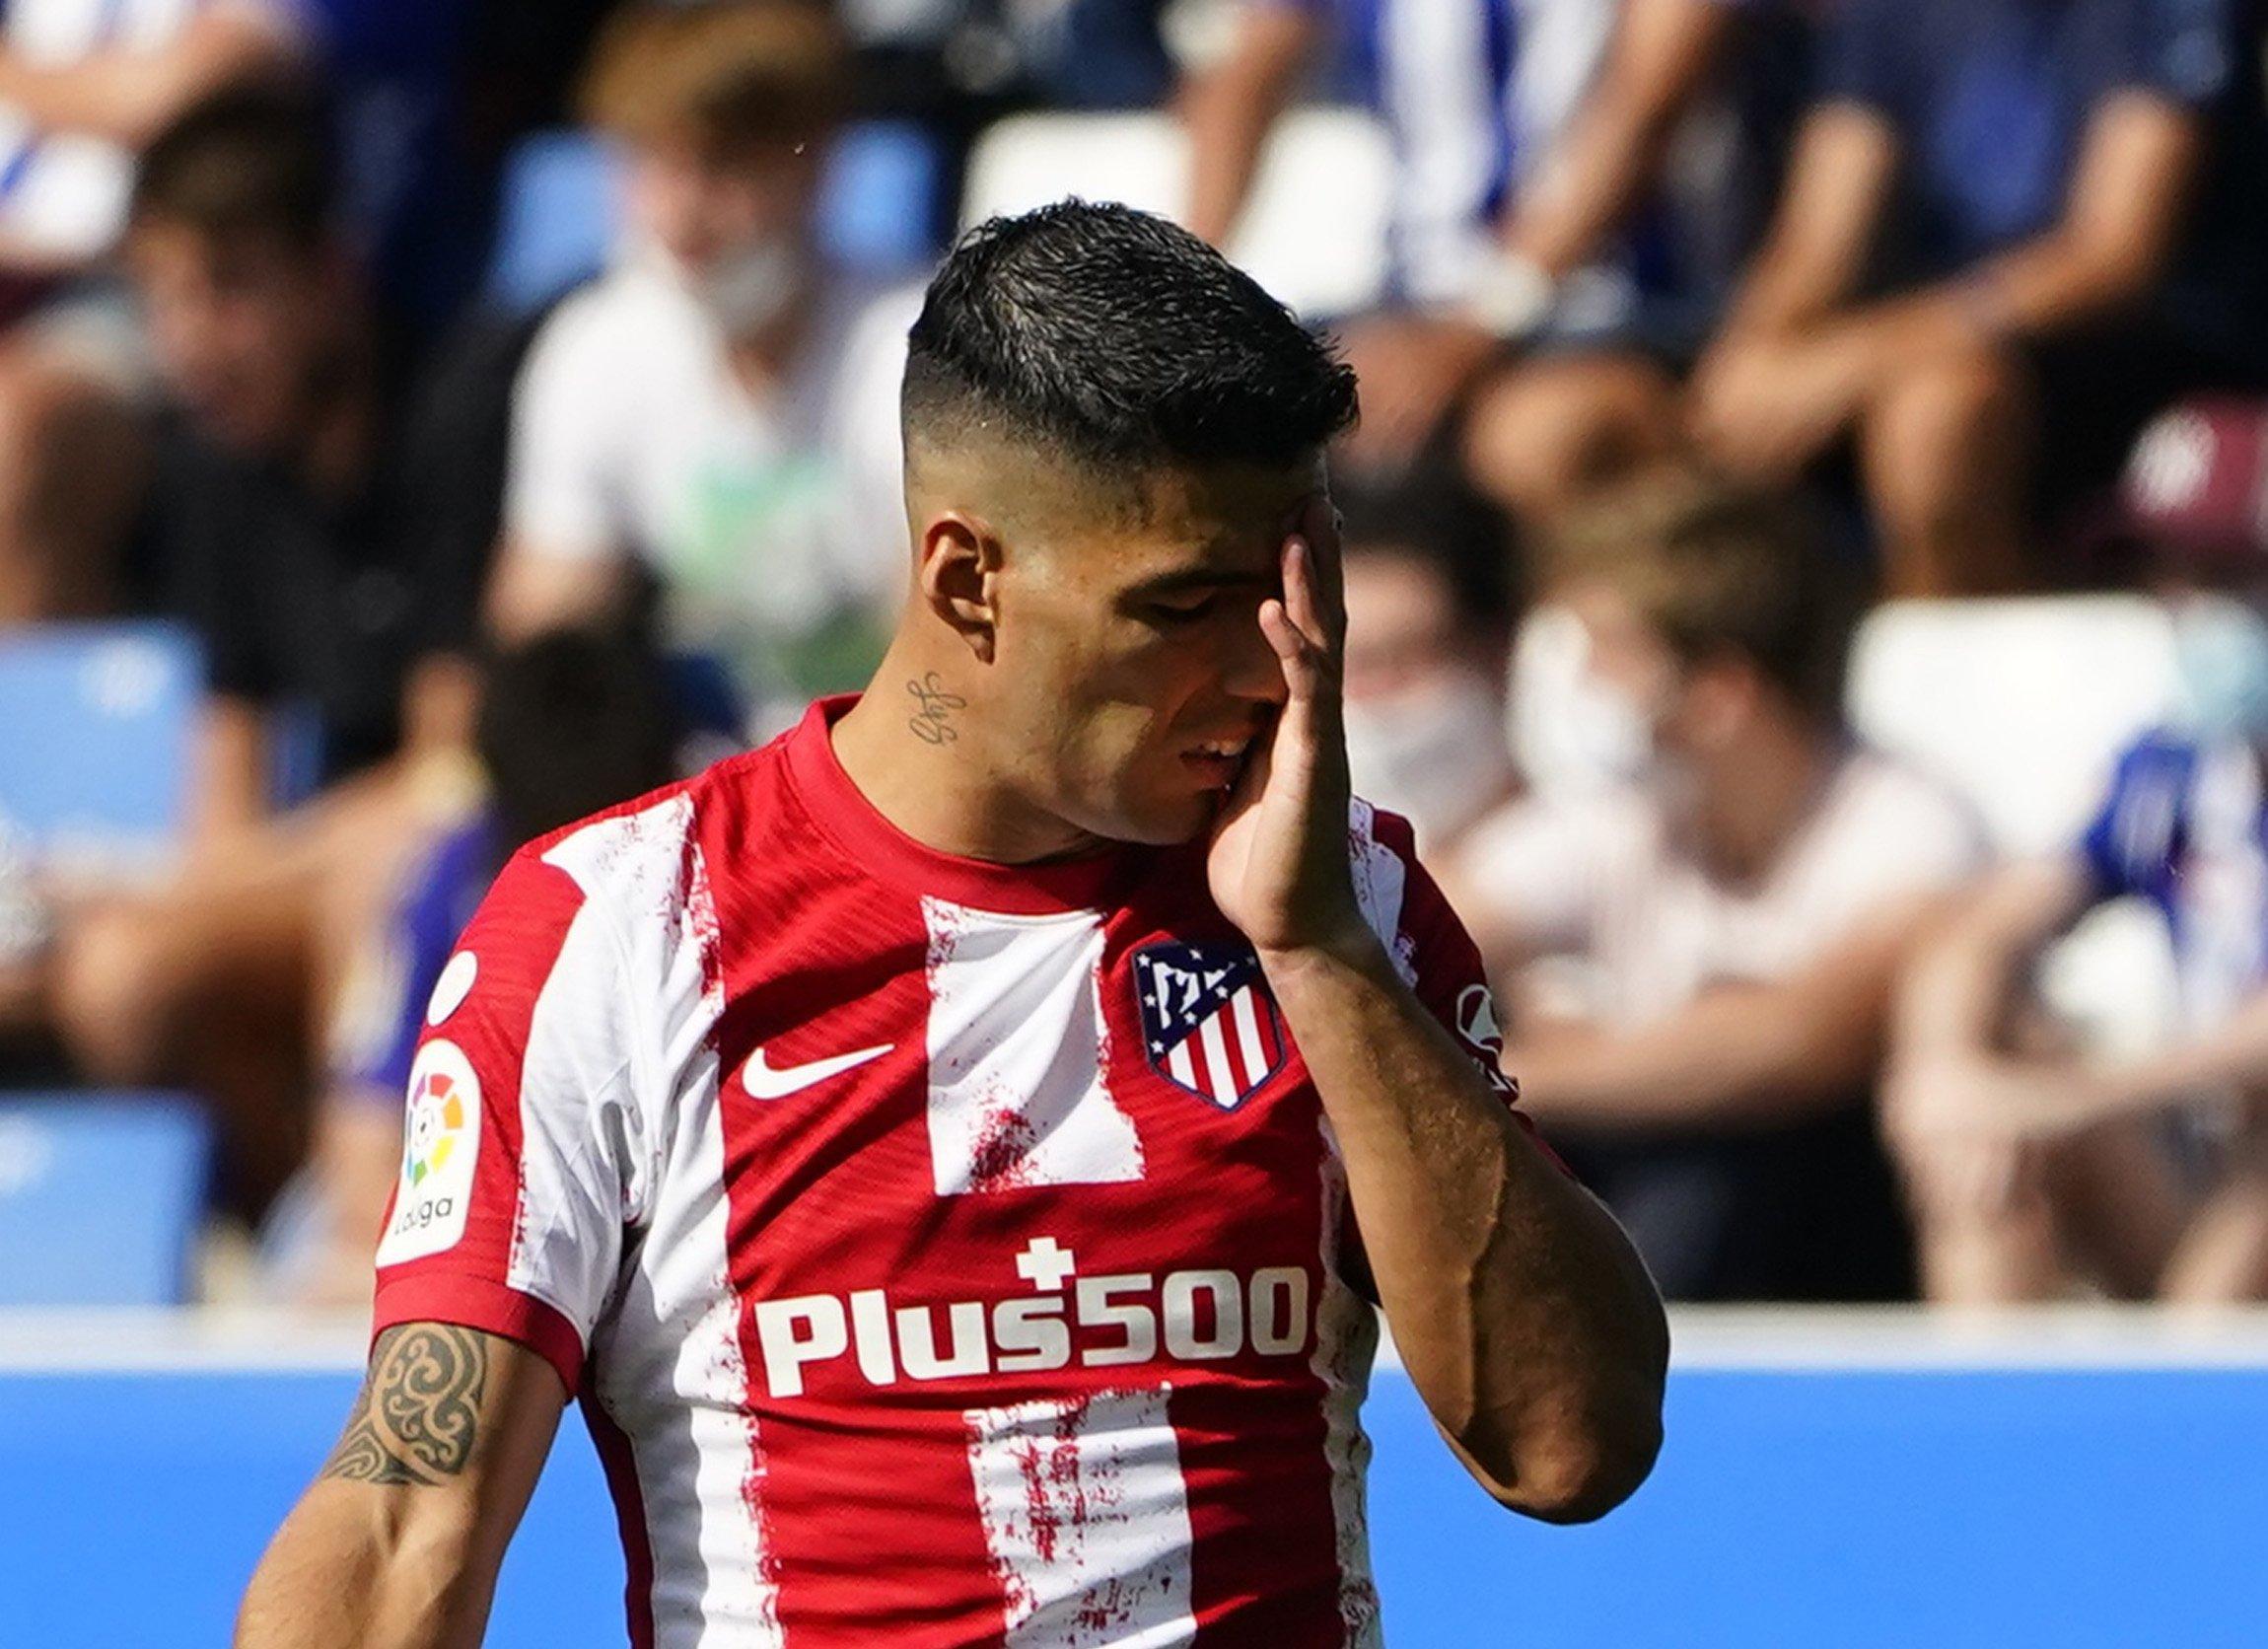 Atletico Madrid's Luis Suarez reacts during a La Liga match against Alaves at Estadio Mendizorroza, Vitoria-Gasteiz, Spain, Sept. 25, 2021.